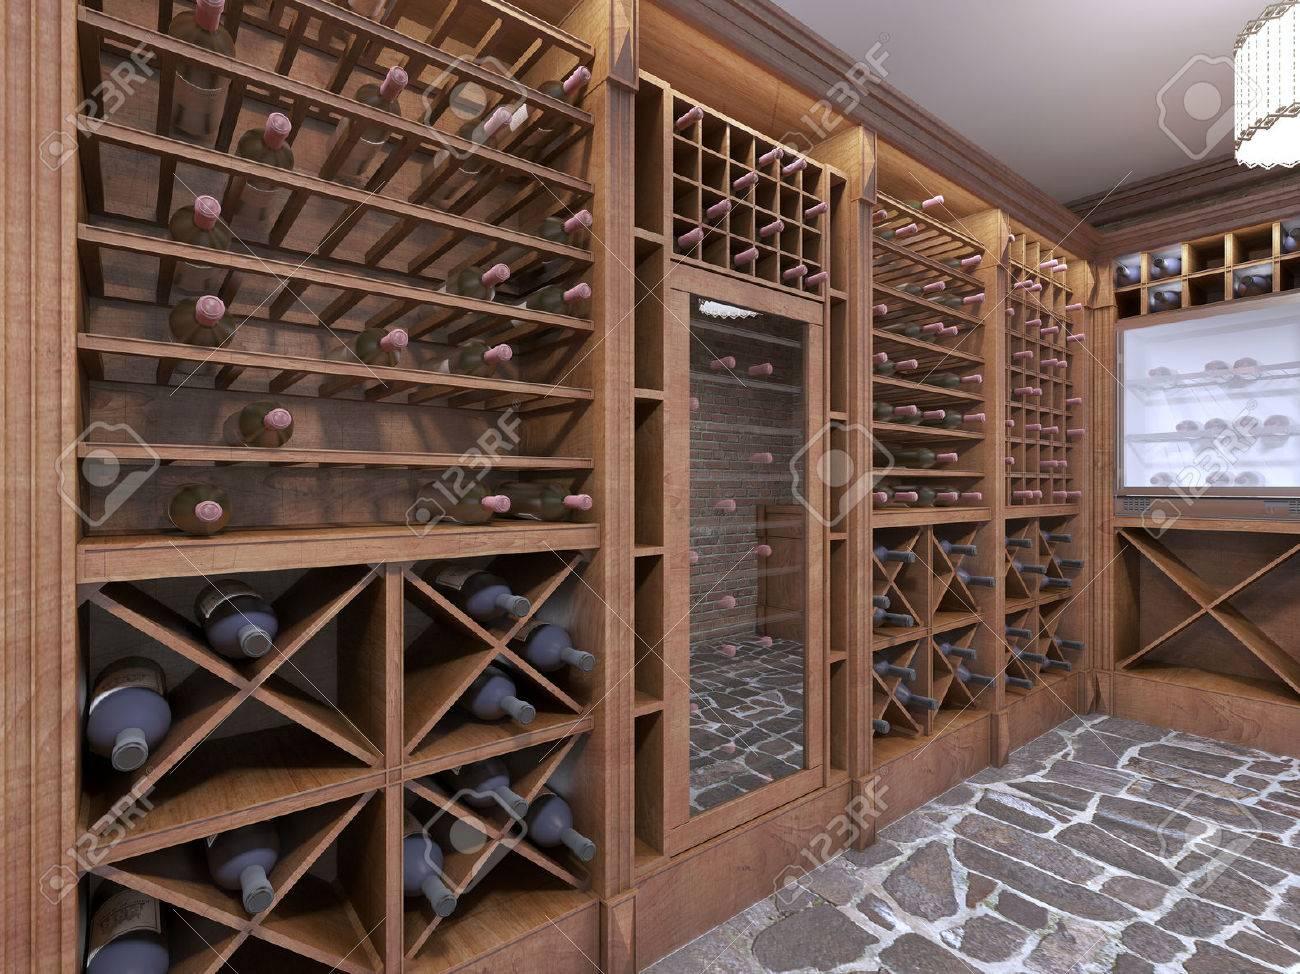 Construire Cave A Vin Maison construire cave a vin maison. awesome construire cave a vin maison